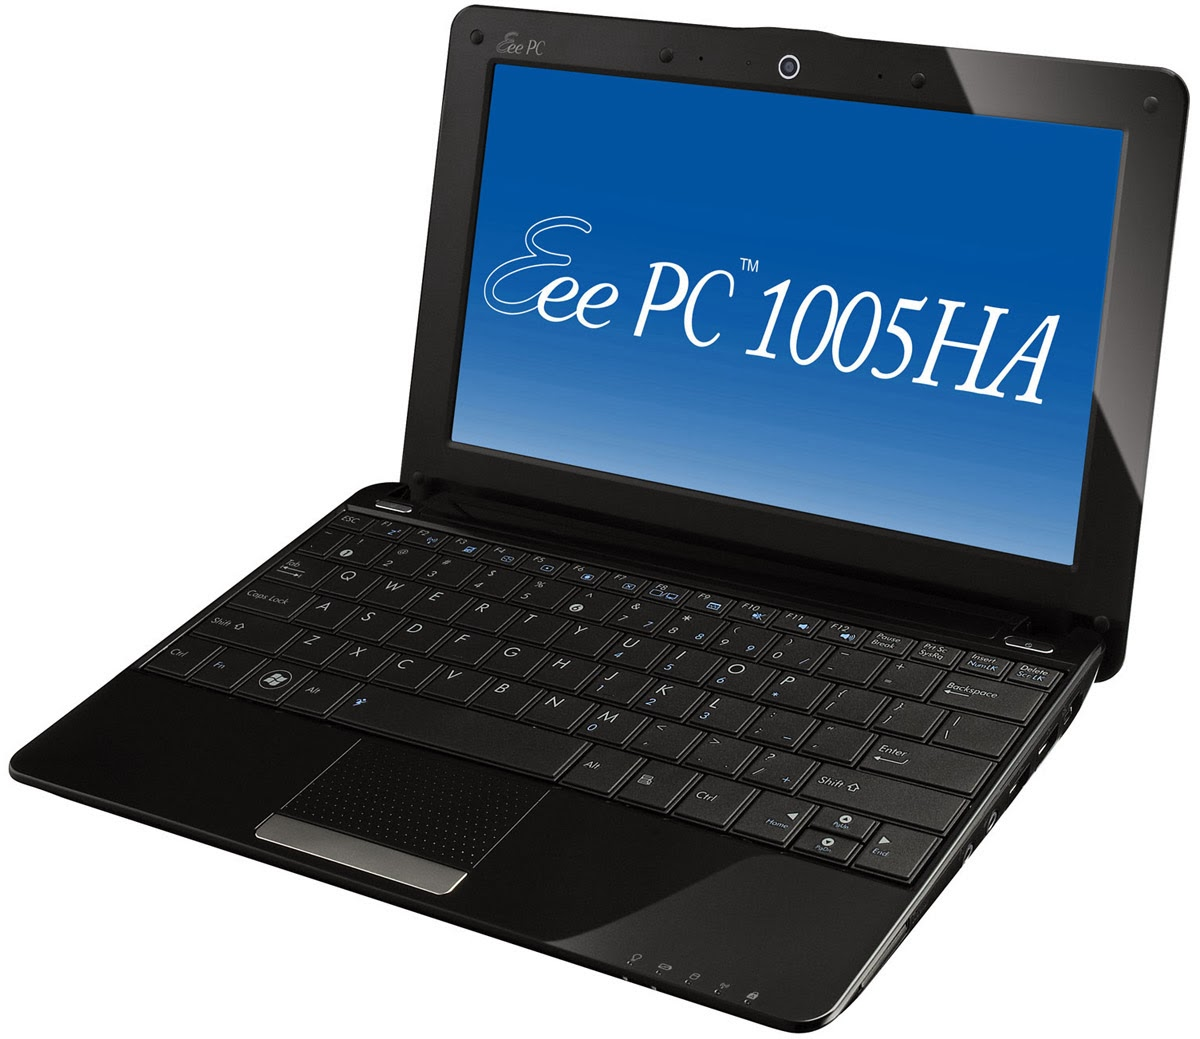 Asus EEE PC 1005HA Drivers Windows 7